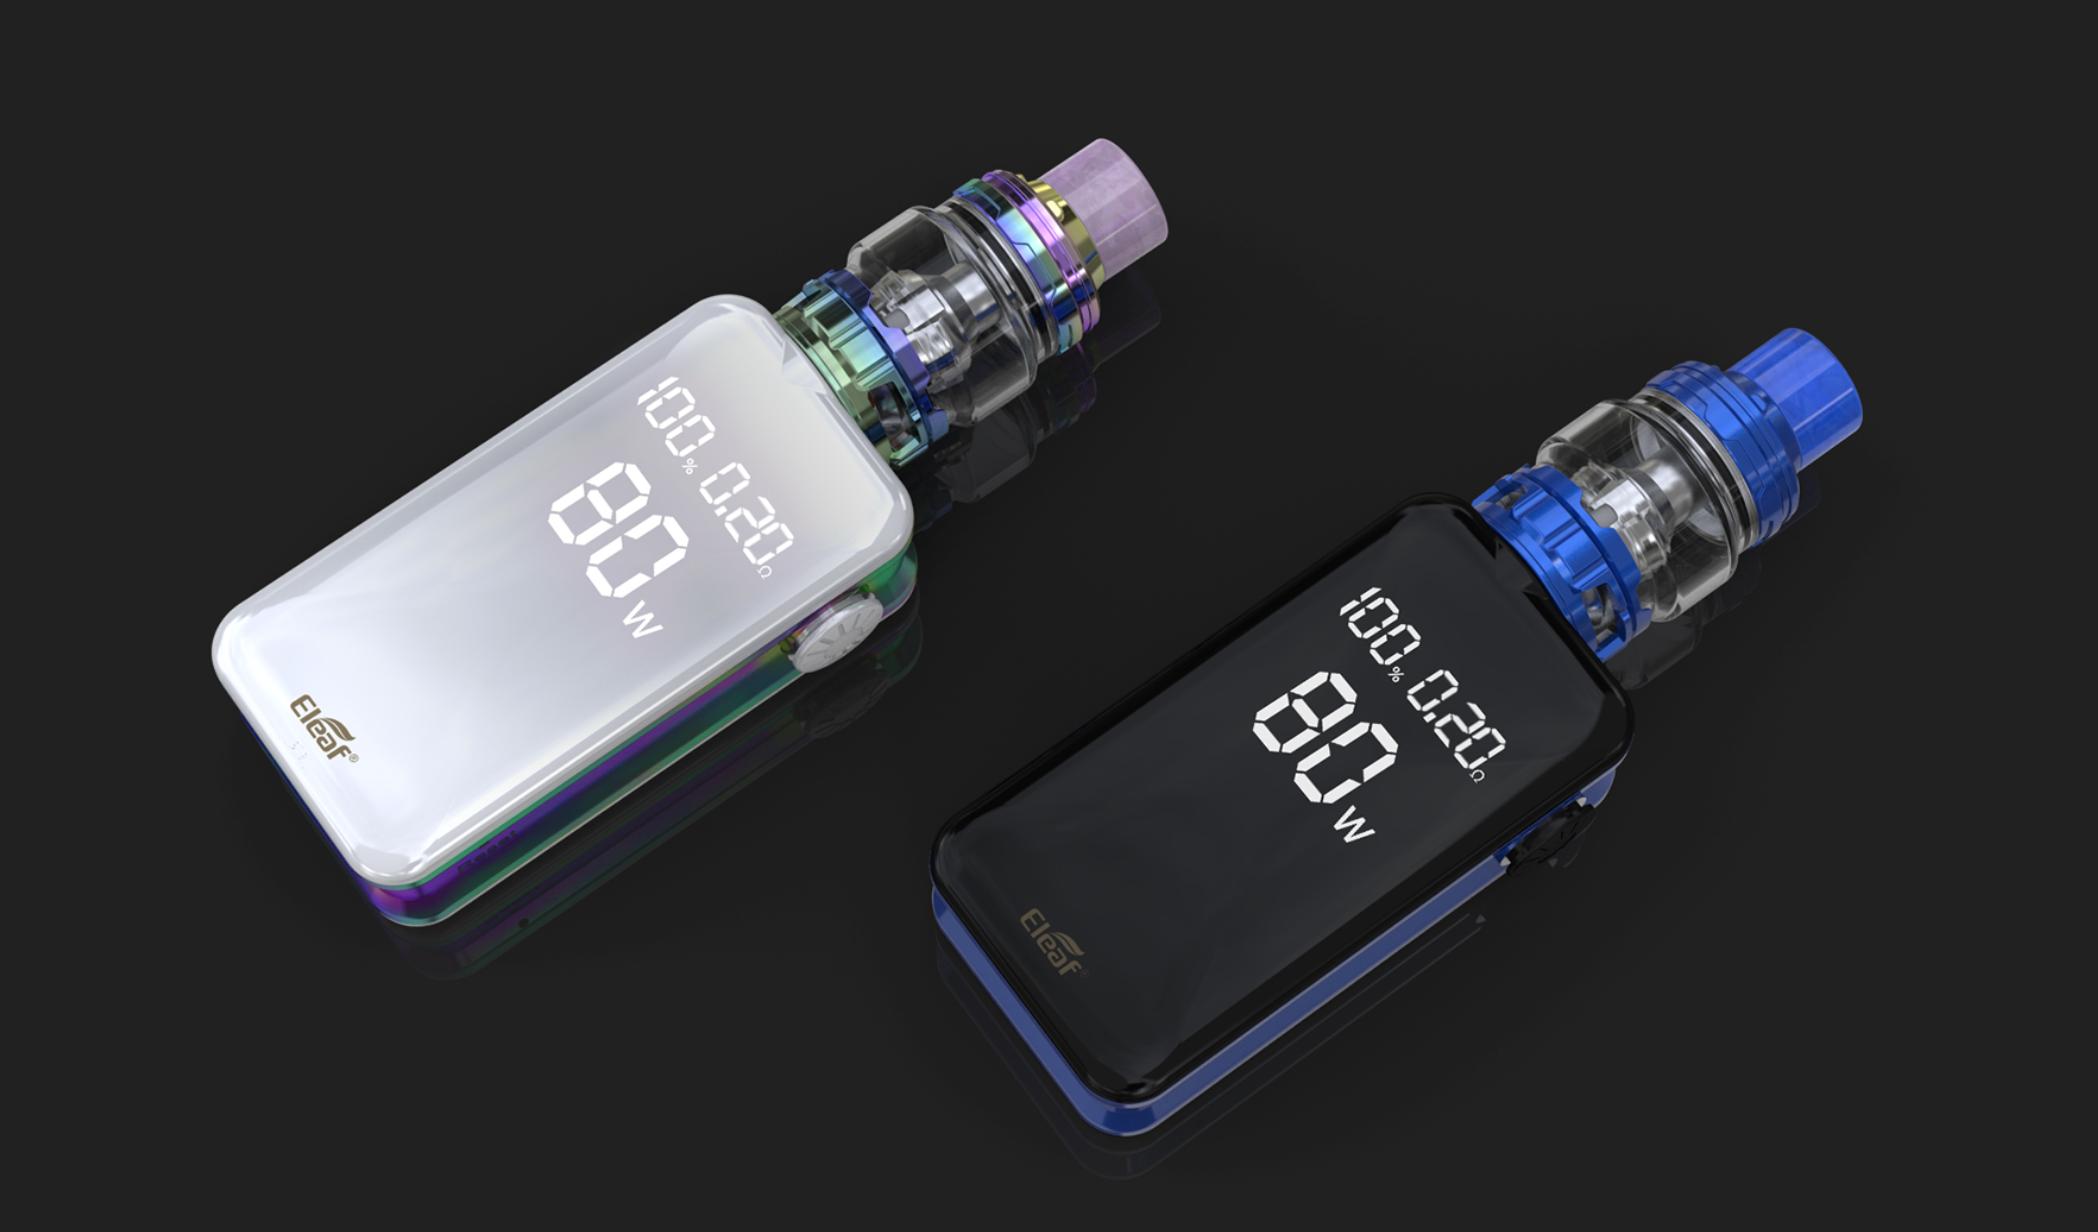 Eleaf iStick NOWOS | FINALLY! A Vape Mod With USB Type-C